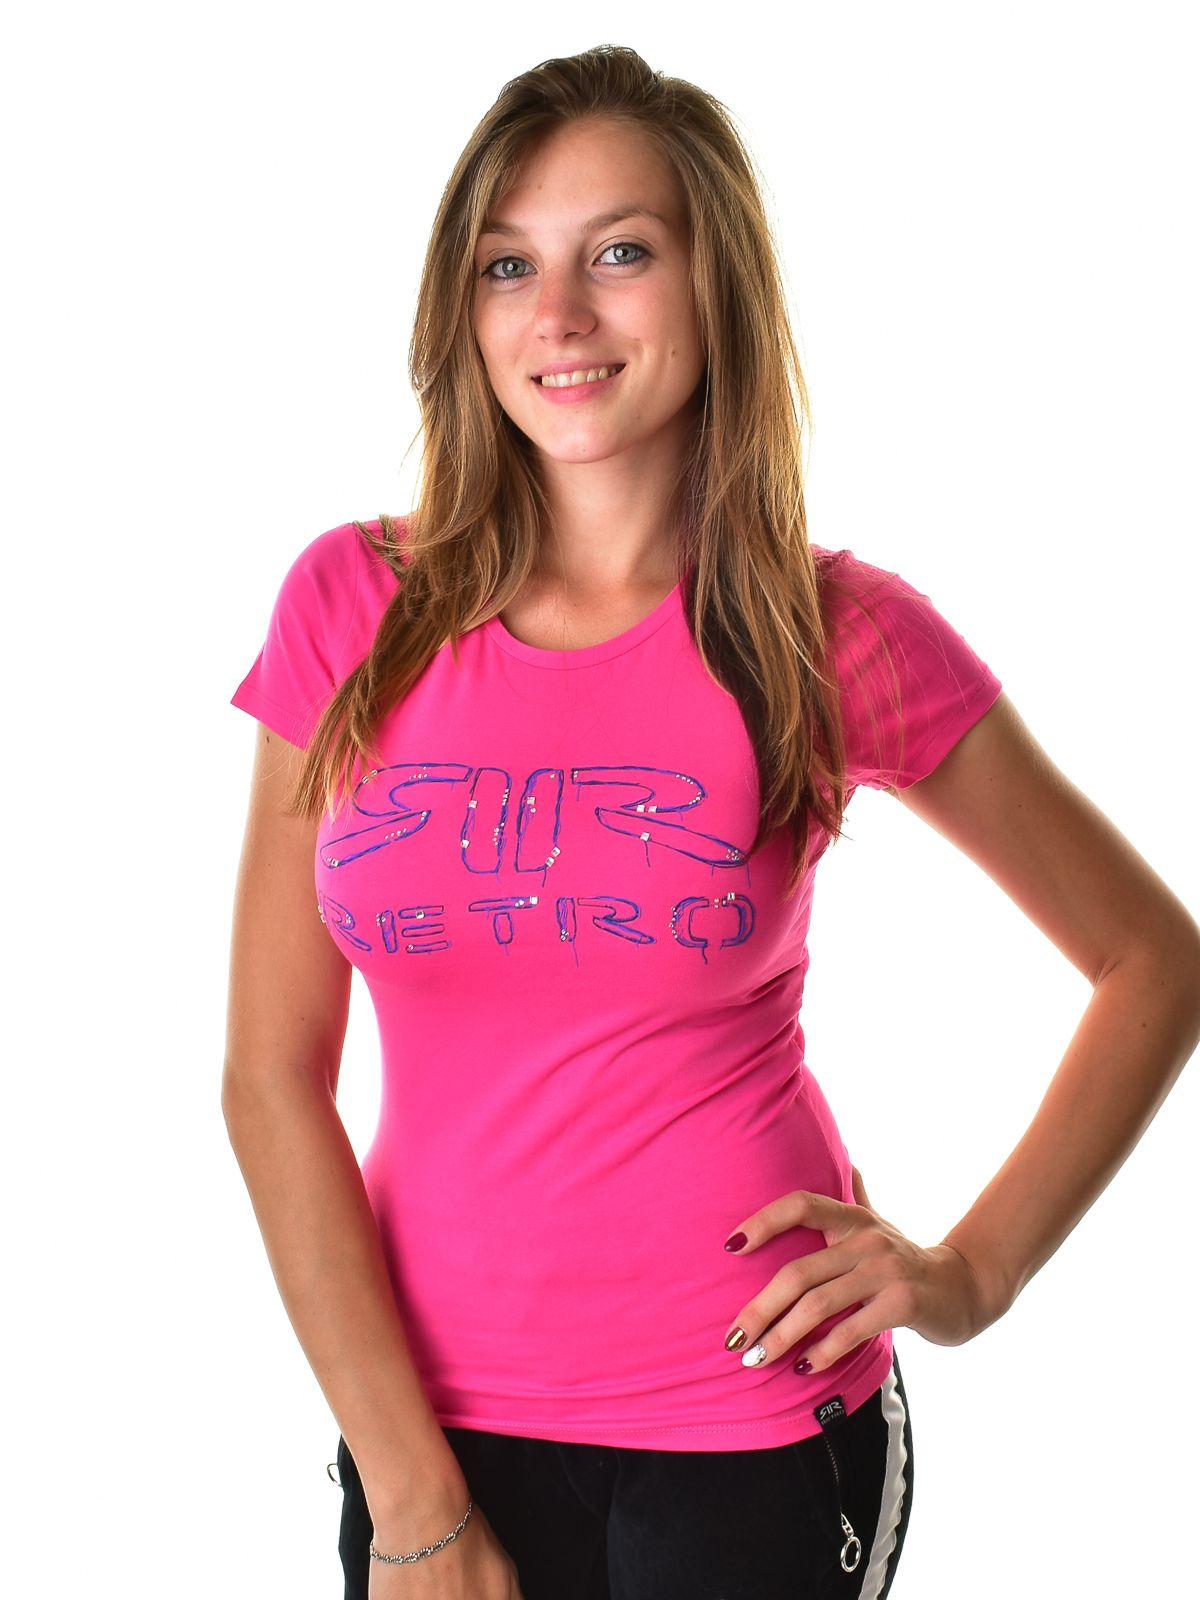 8f5505a809 Retro Jeans női póló SHARON T-SHIRT | Markasbolt.hu Hivatalos RETRO ...